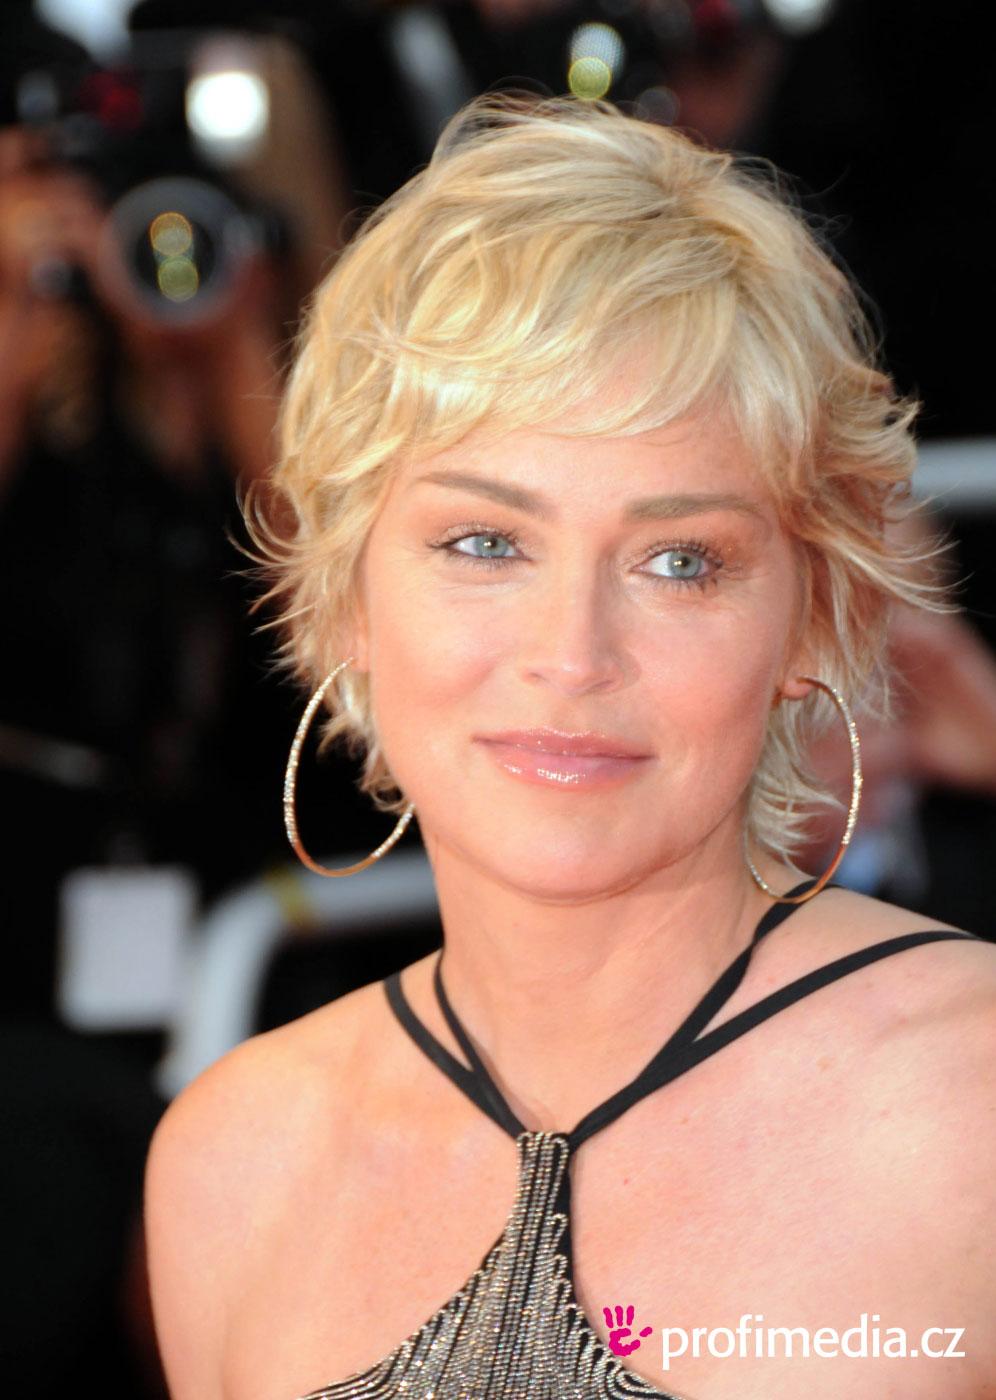 Prom hairstyle - Sharon Stone - Sharon Stone